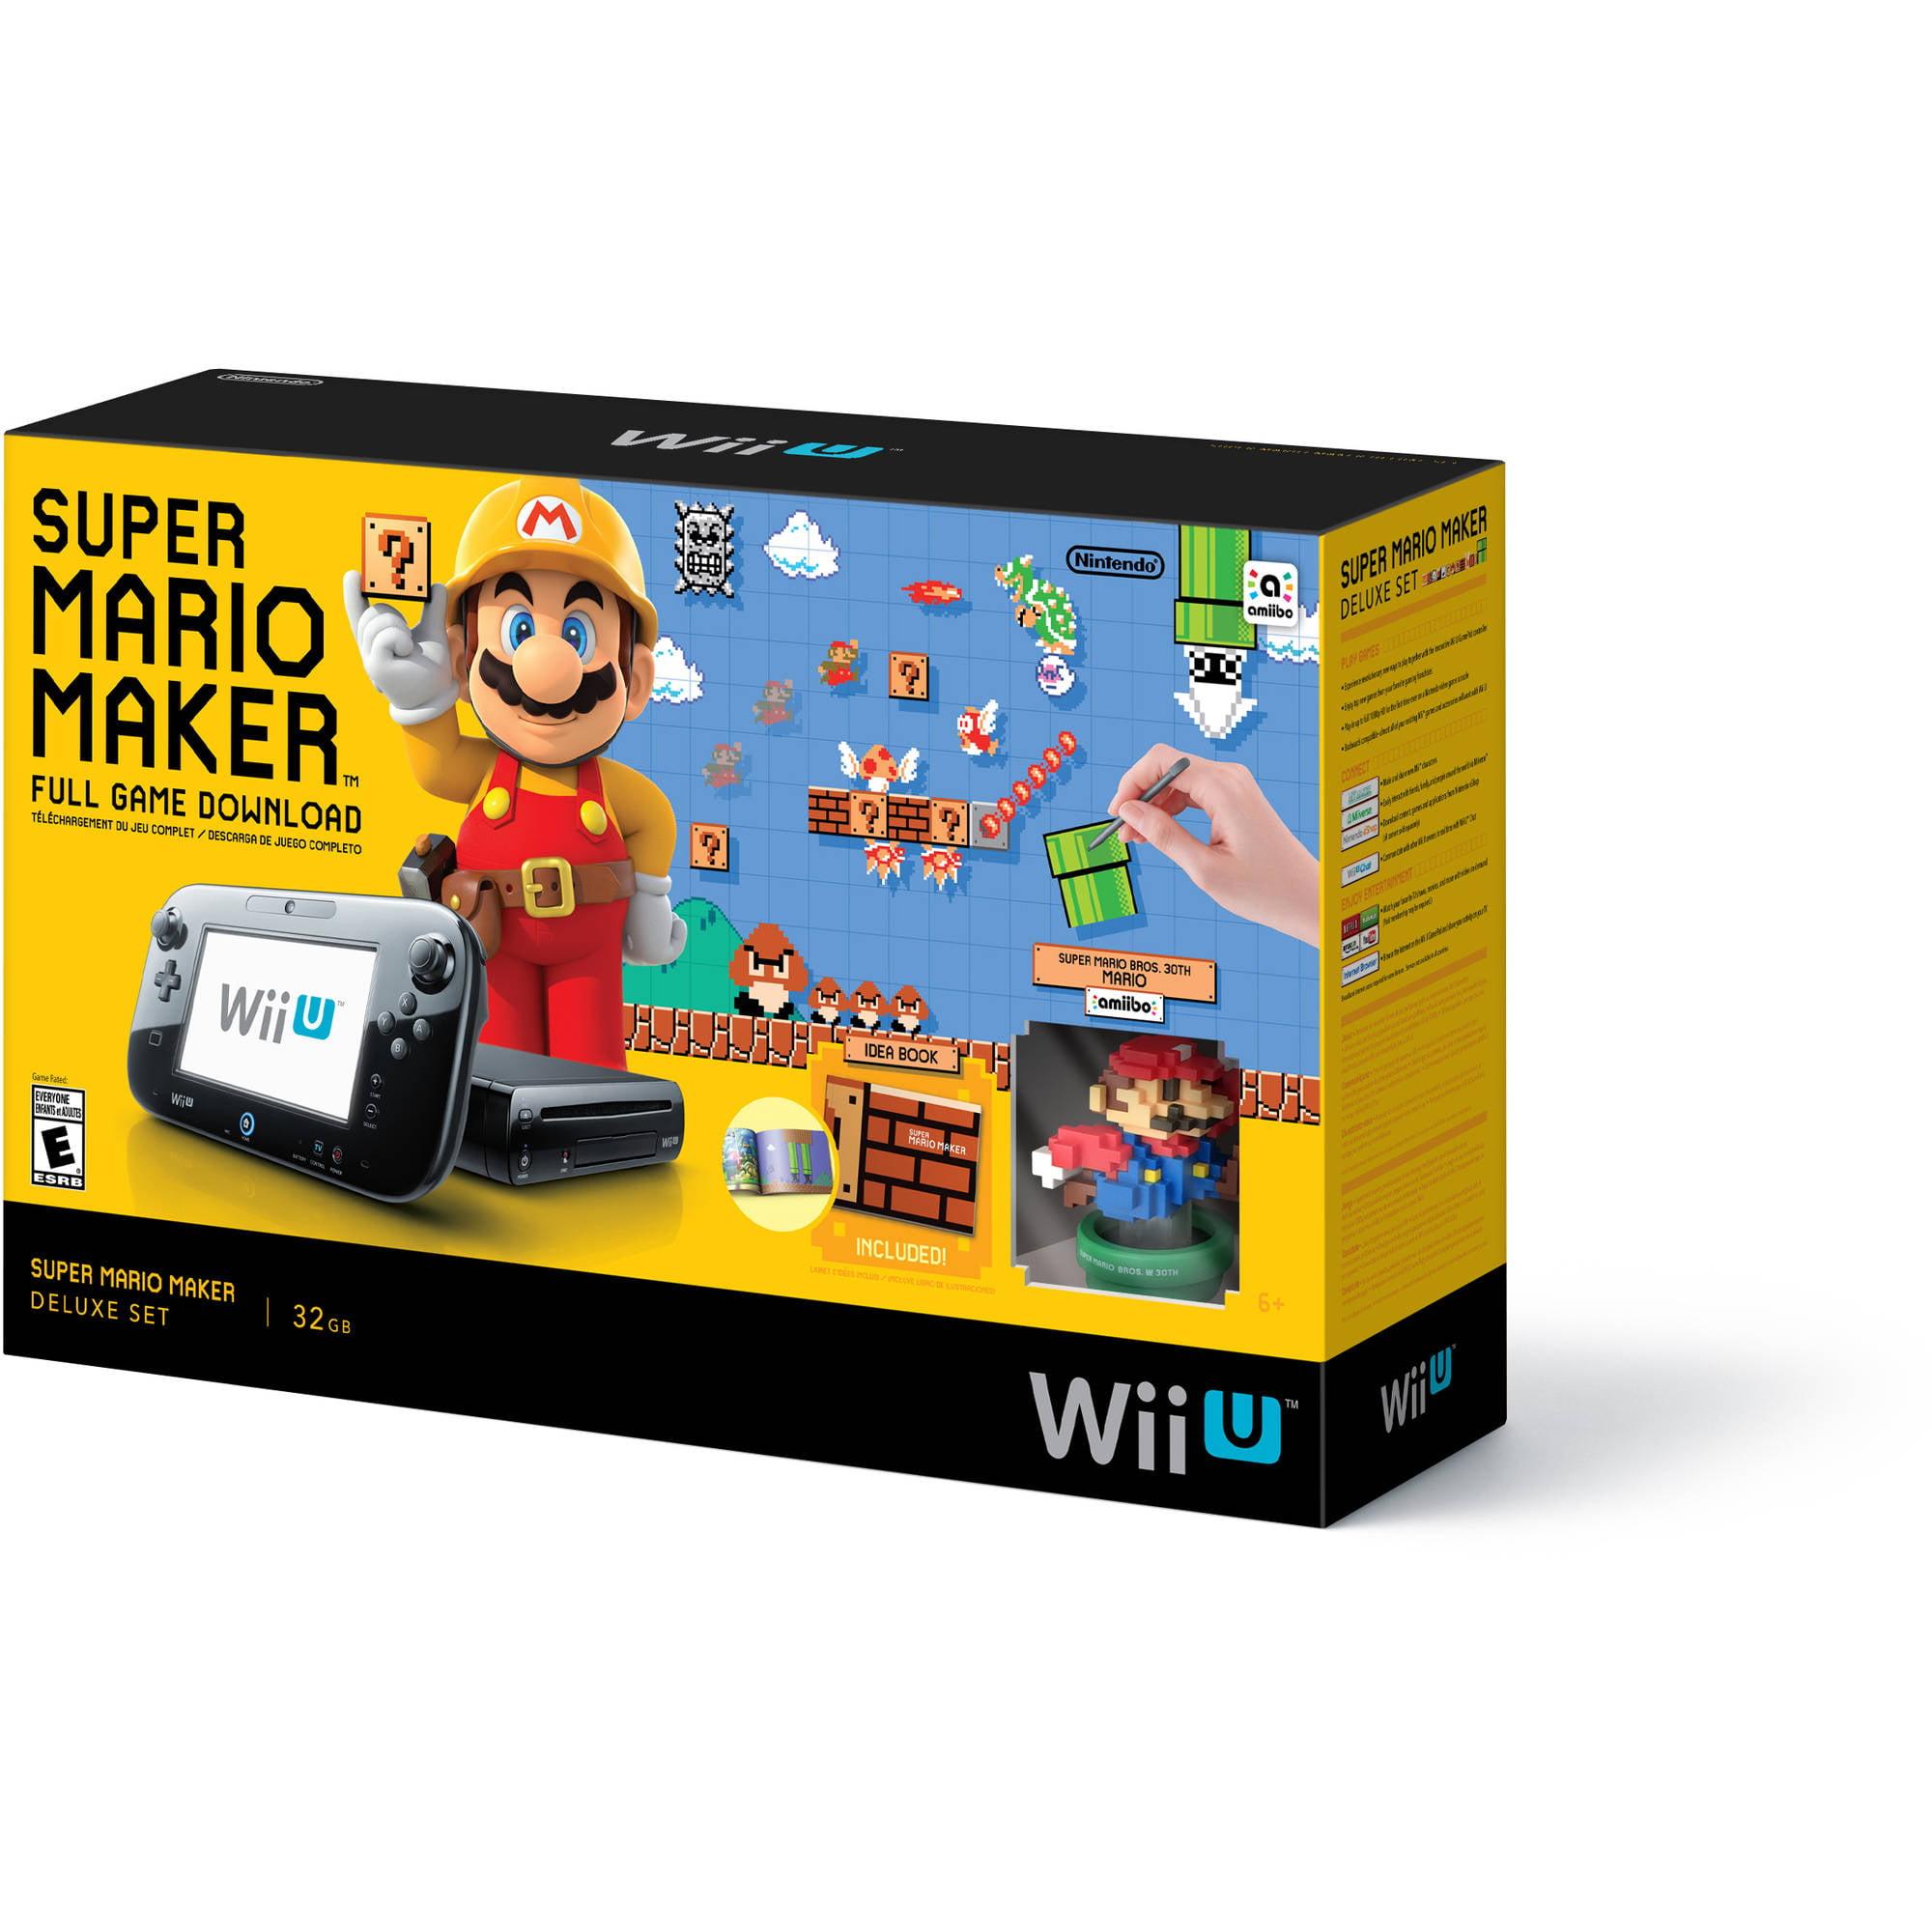 Game boy color super mario bros deluxe - Nintendo Wii U Deluxe Console Set Black With New Super Mario Bros U And New Super Luigi U Walmart Com